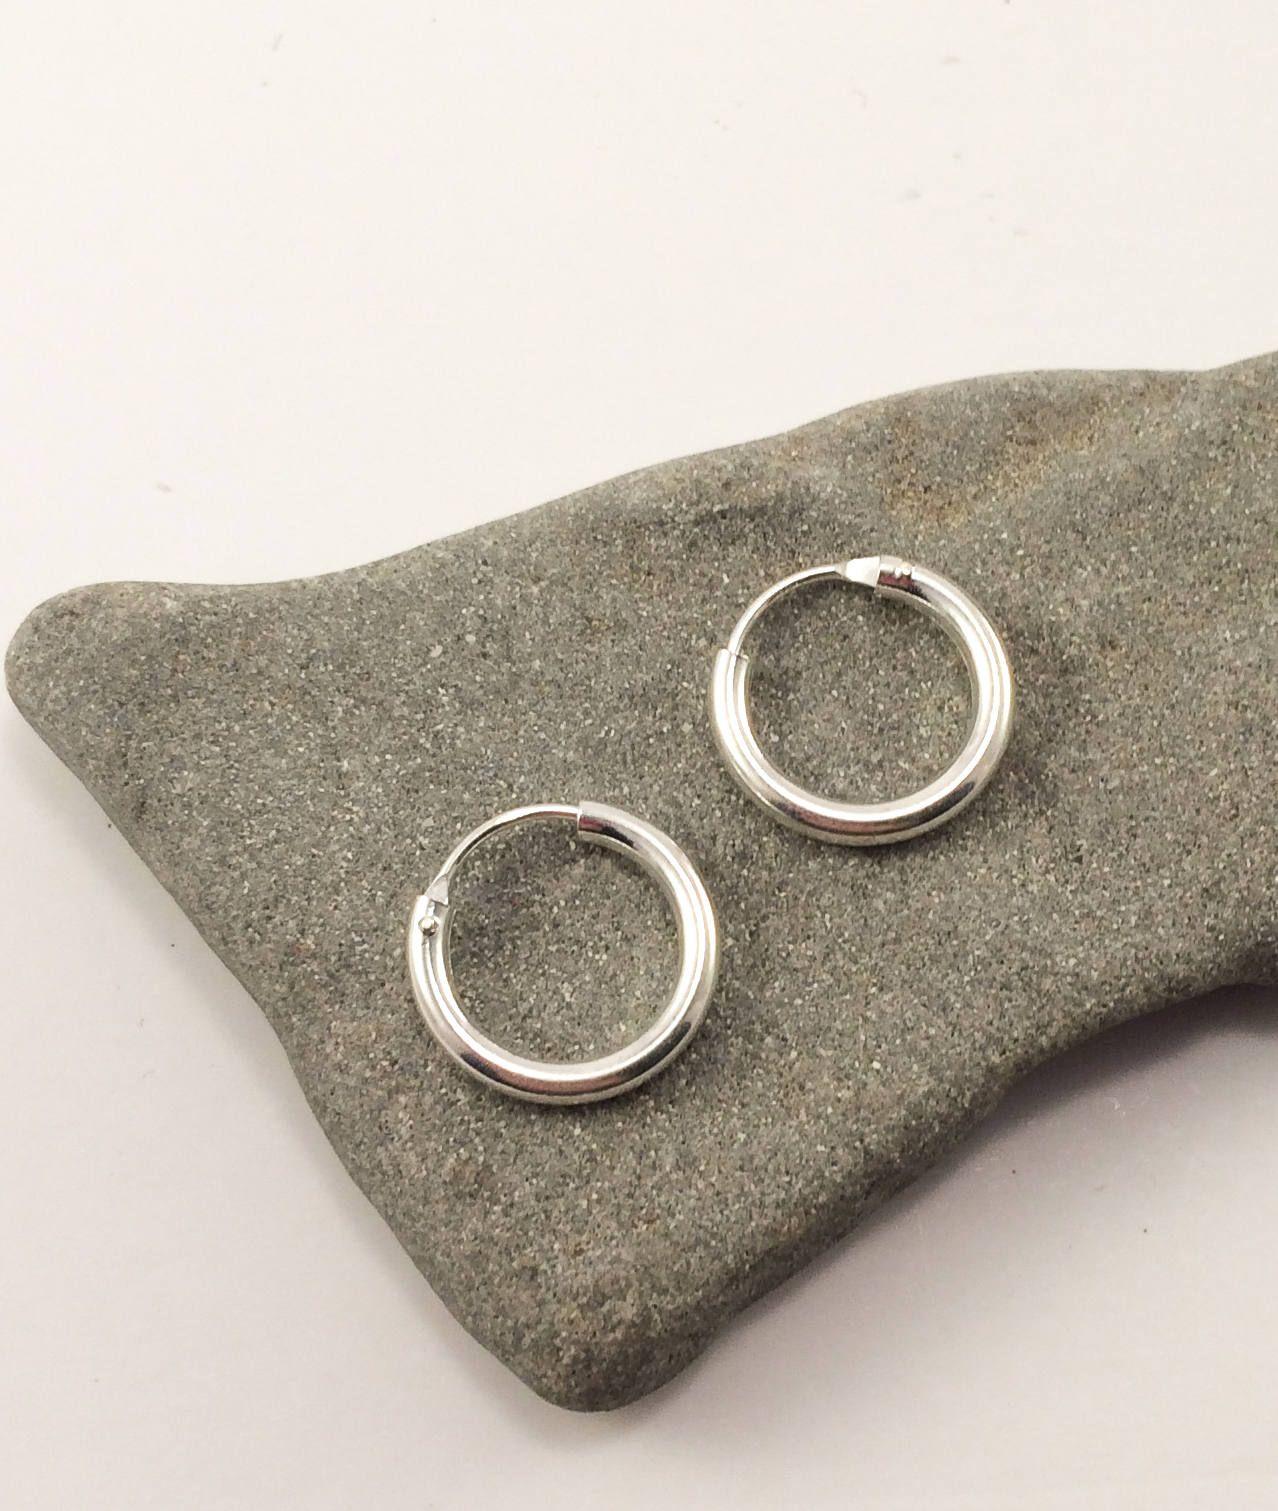 be9247ad4 Silver hoop earrings, silver chunky hoops, Boho hoops, sterling silver  indian style gypsy hoop earrings, small hoops, shine, Fat hoops, Gift by  SPIRALICA on ...